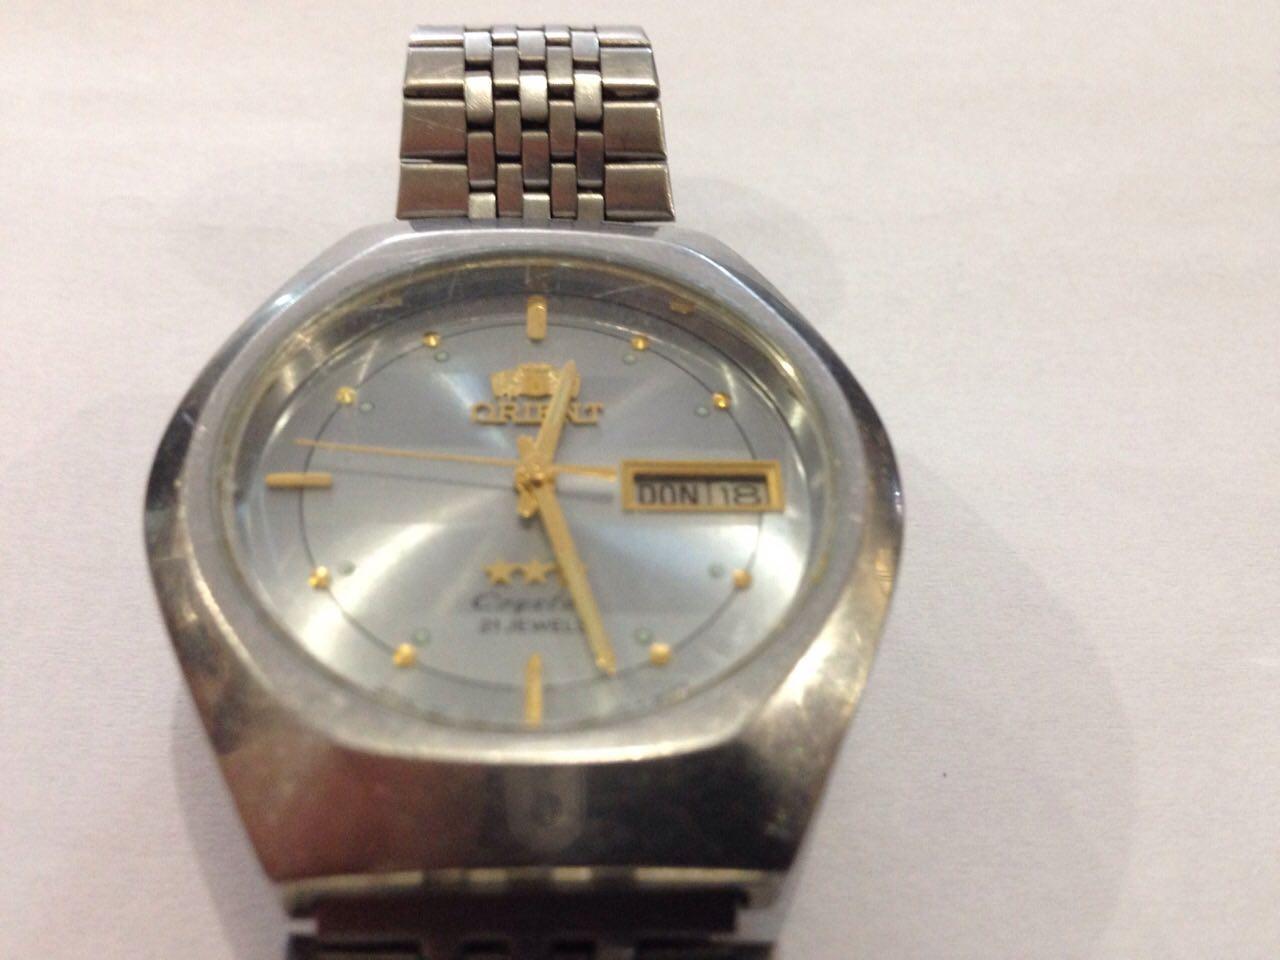 Наручные часы orient 21 jewels цена паровоз часы купить